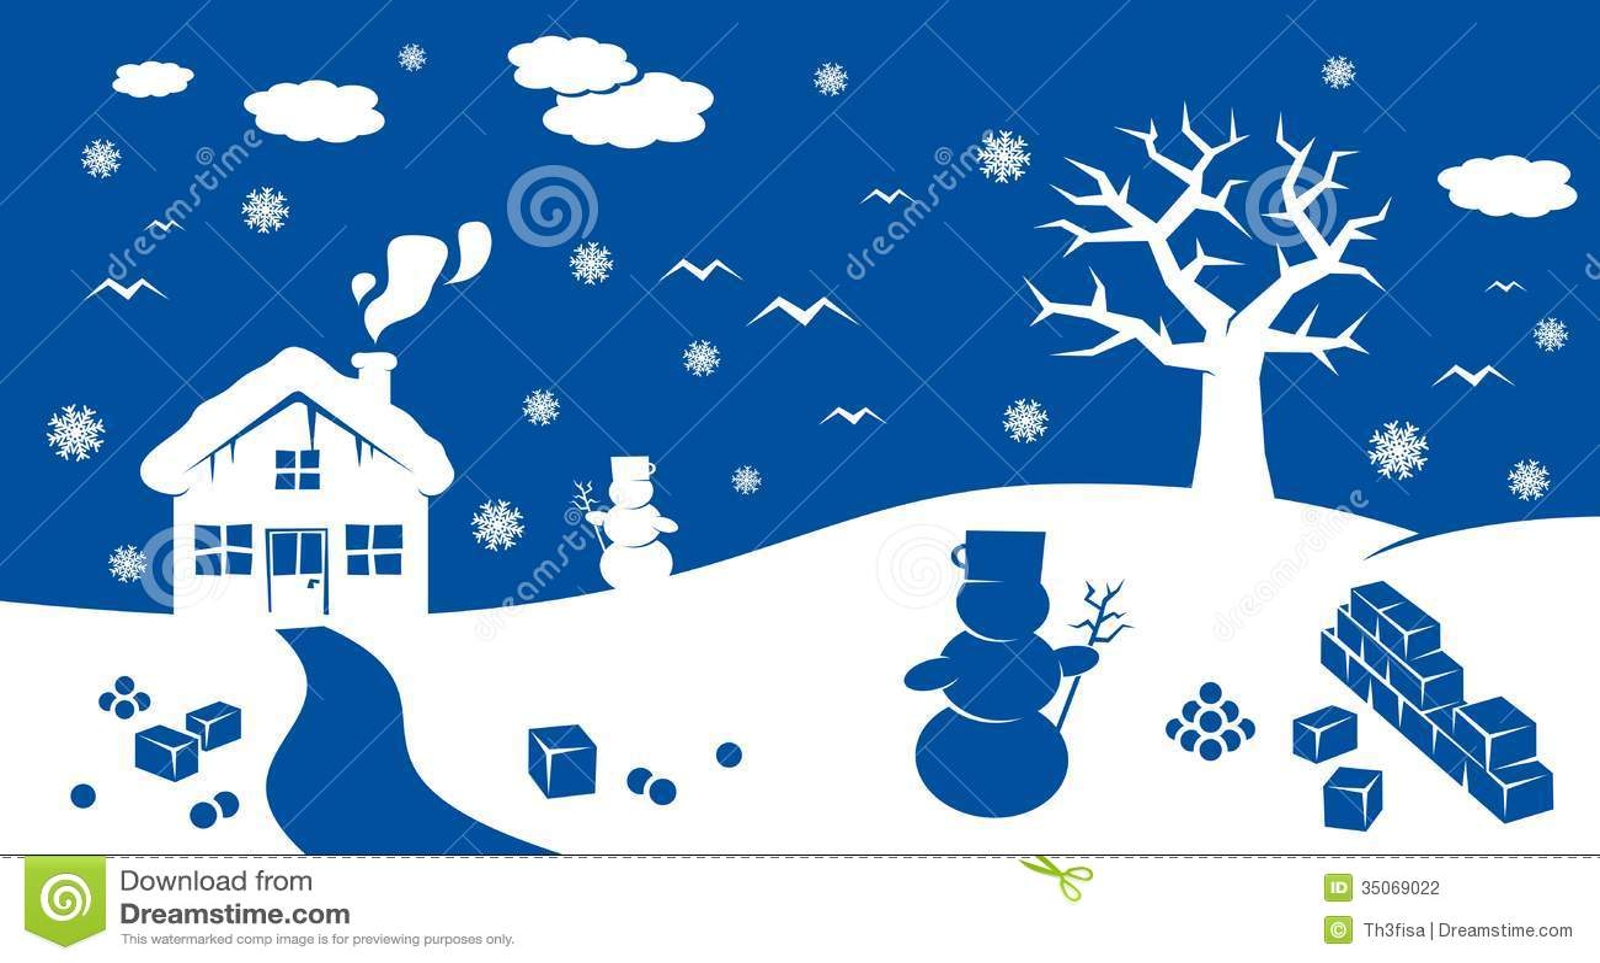 Cute Doodle Wallpaper Hd Winter Cartoon